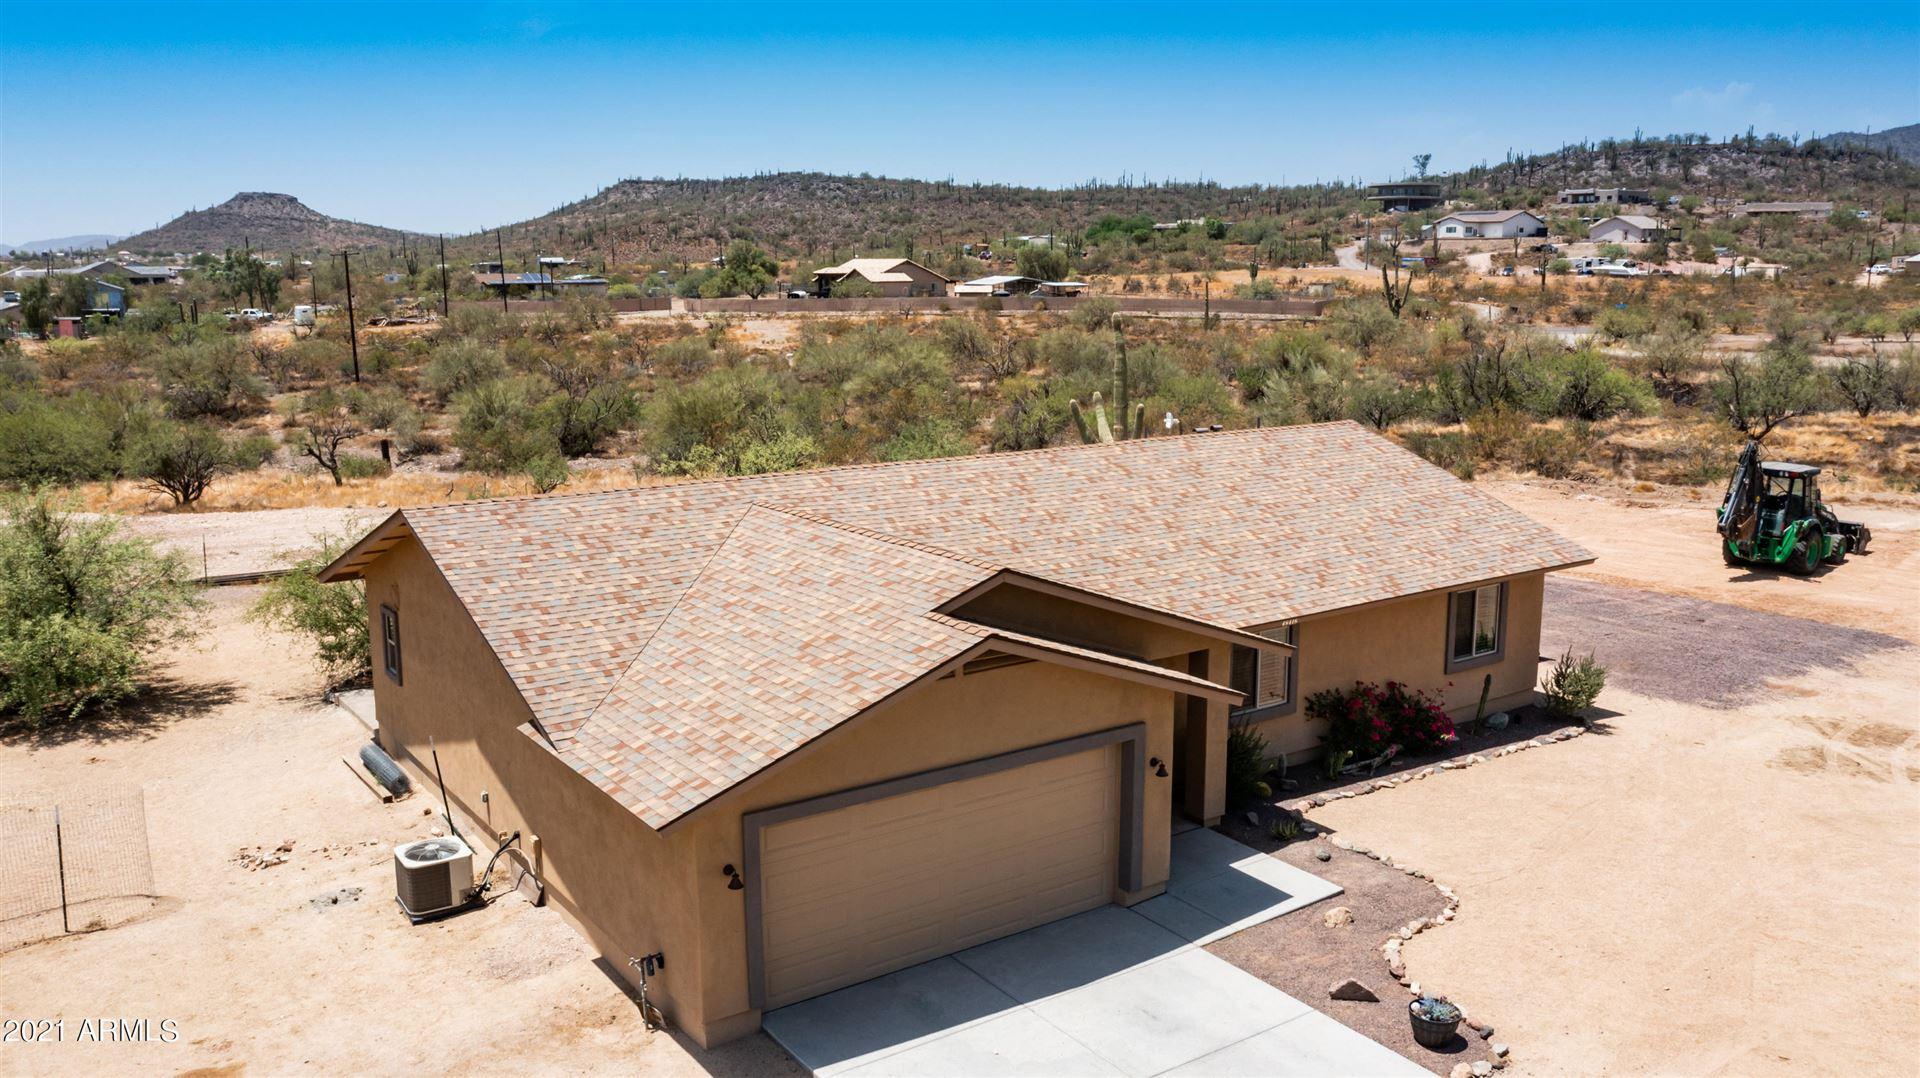 Photo of 48418 N 7TH Avenue, New River, AZ 85087 (MLS # 6263338)